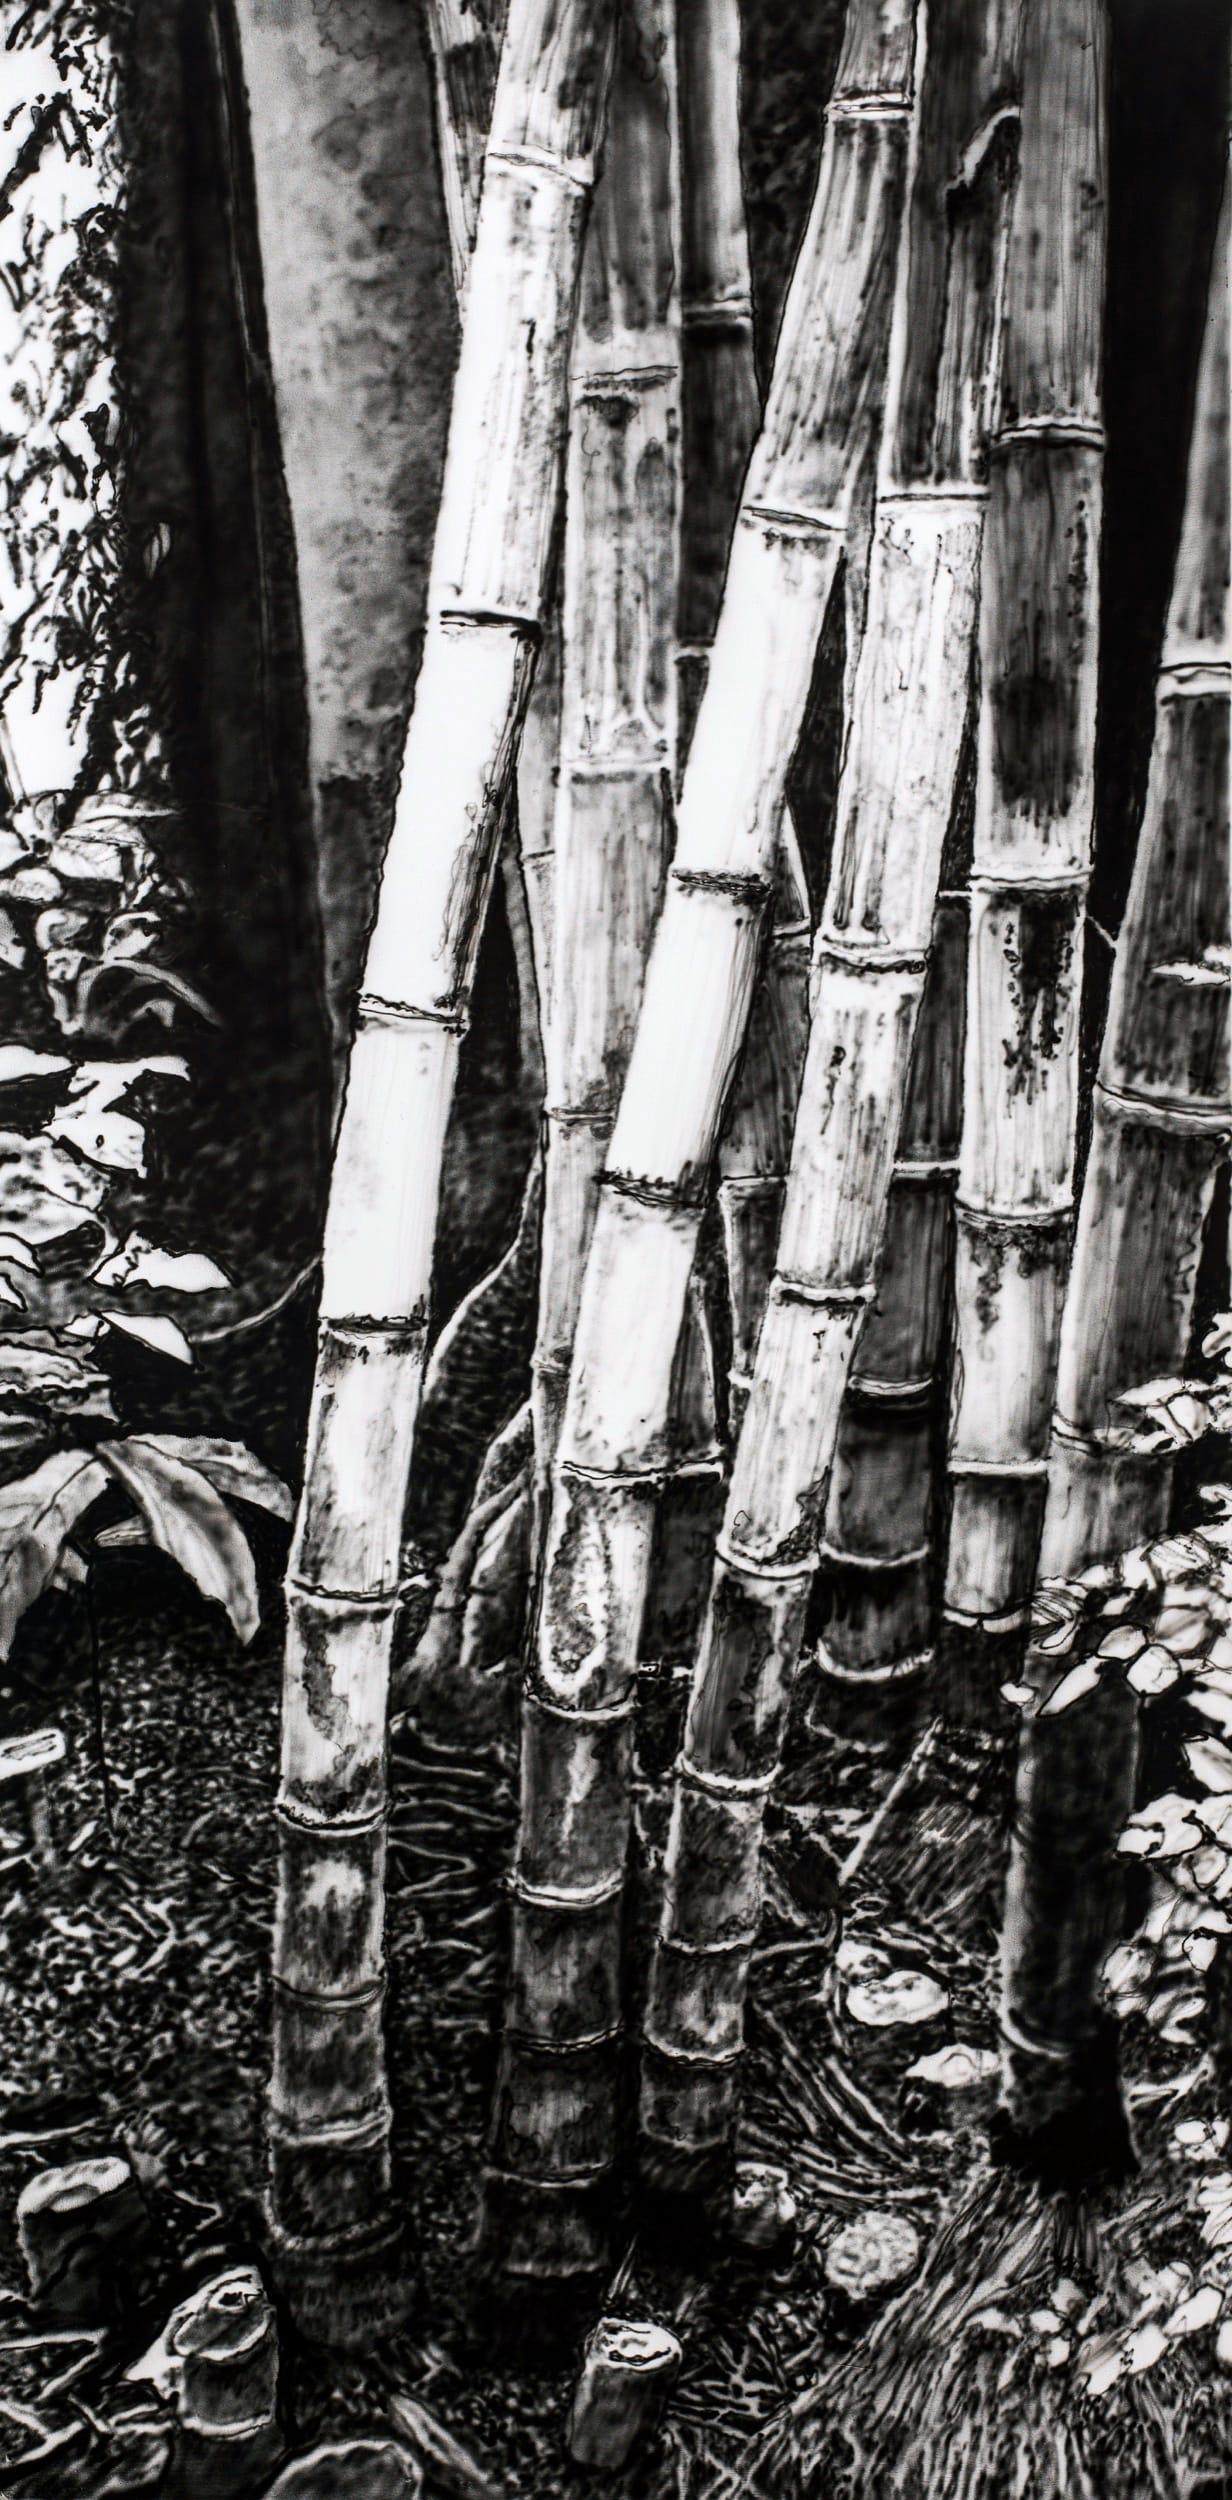 Bamboos. Oil on canvas, 80 x 160 cm, 2019